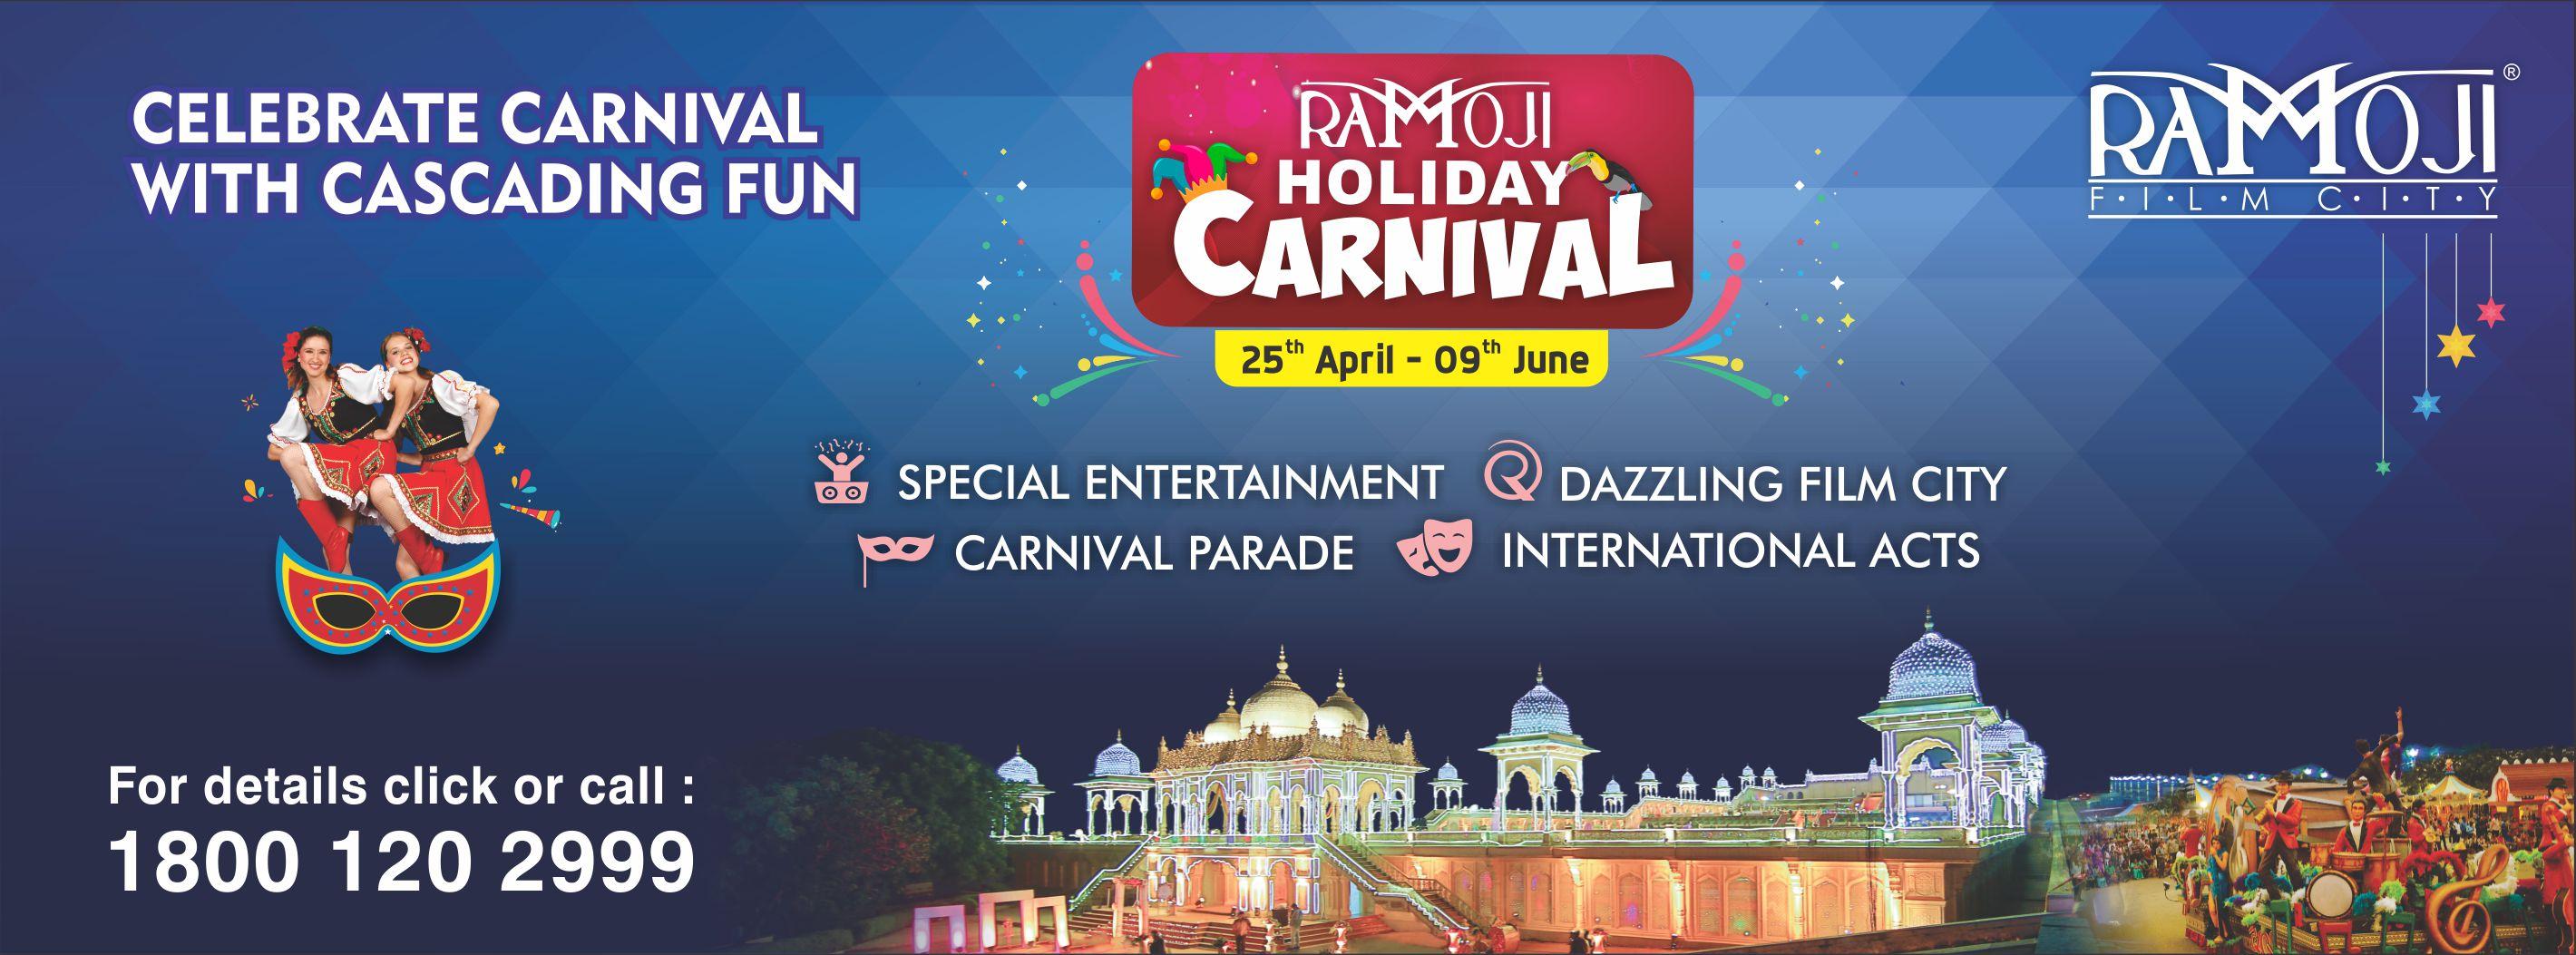 Ramoji Film City Holiday Carnival Celebrations 2019, Hyderabad, Telangana, India